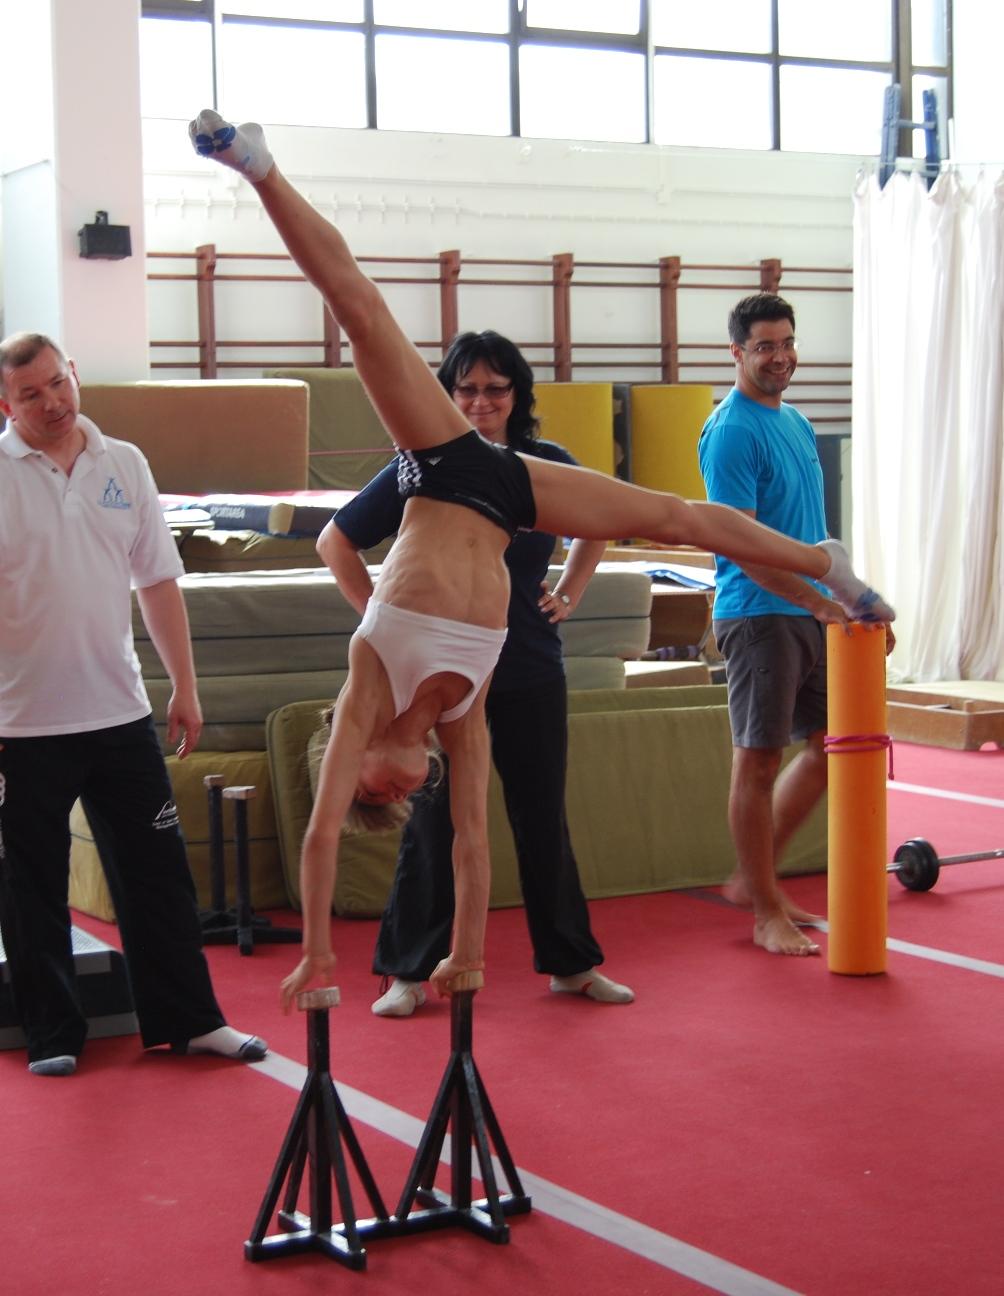 Gymnastics straddle